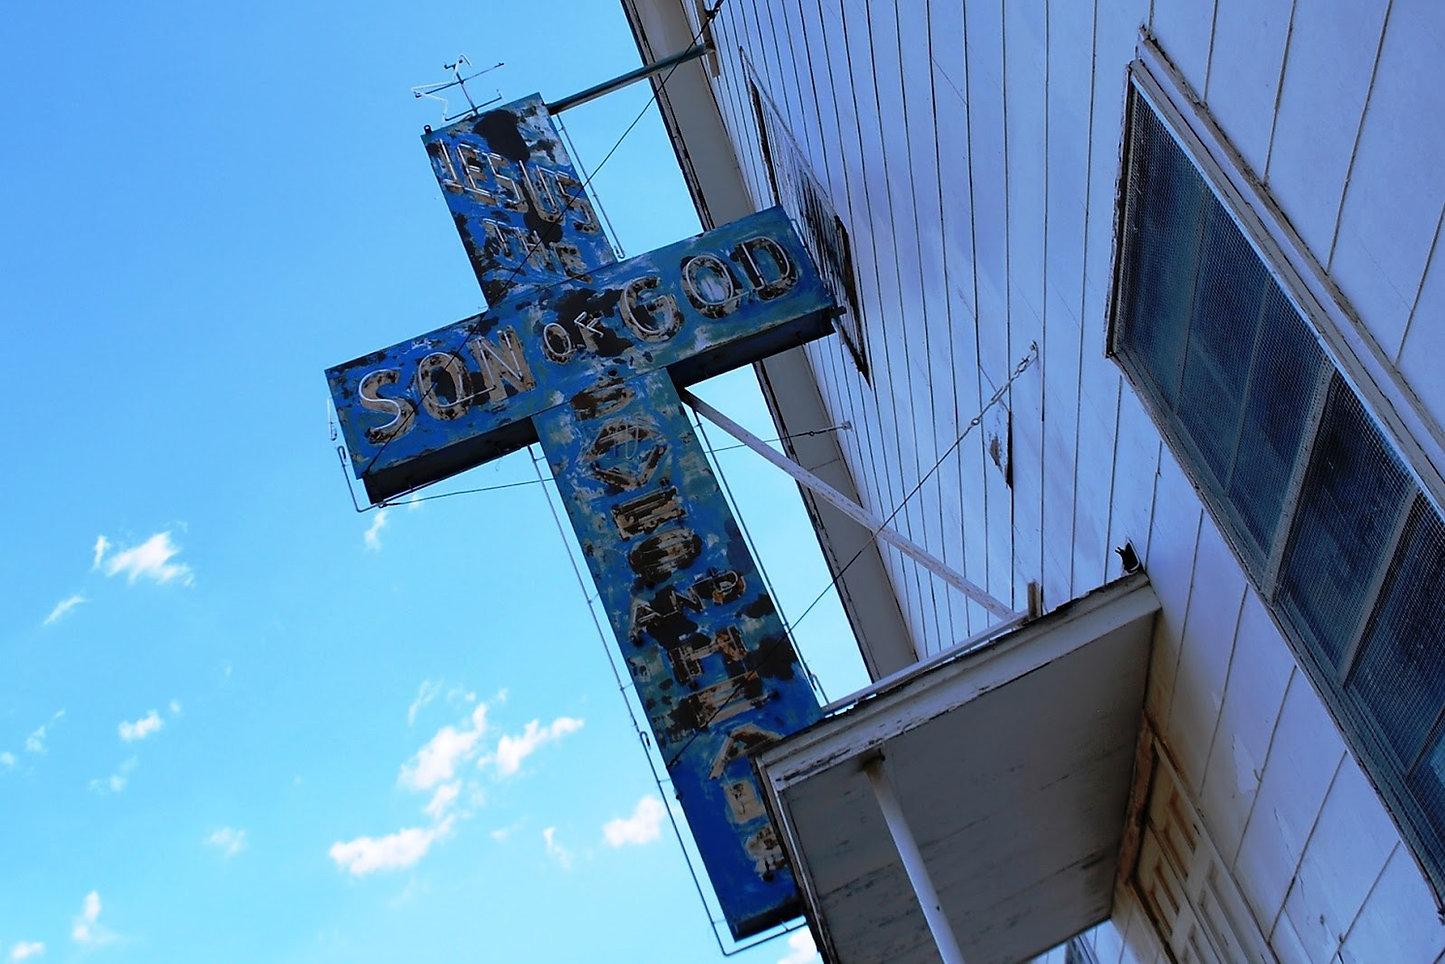 Jesus+Retro+Sign.jpg